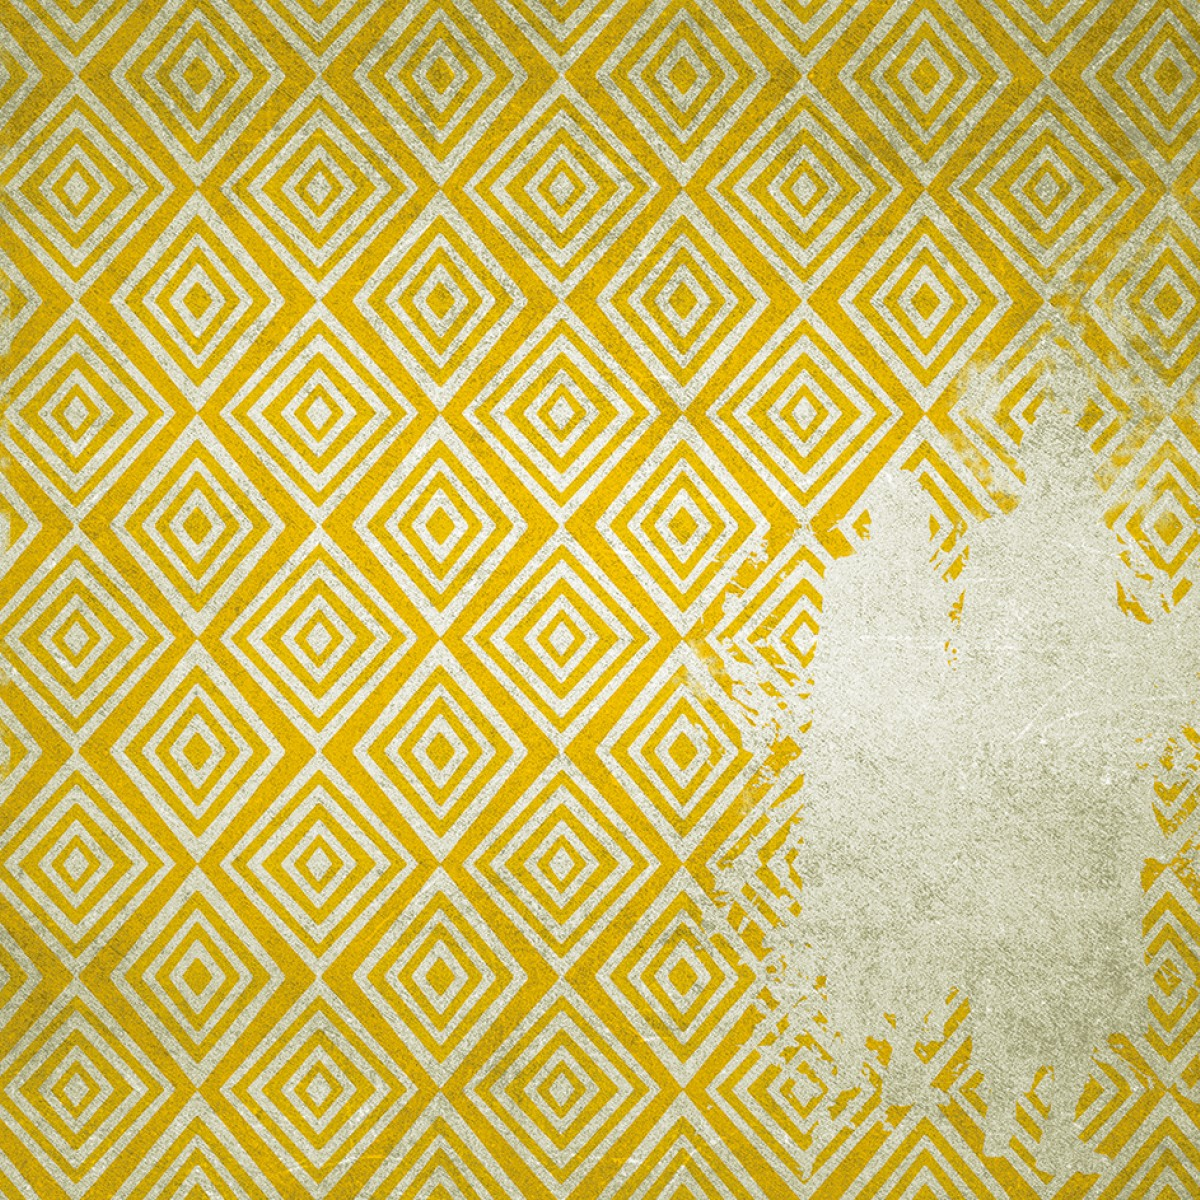 Fototapet Yellow JO 2730-1, TresTintas